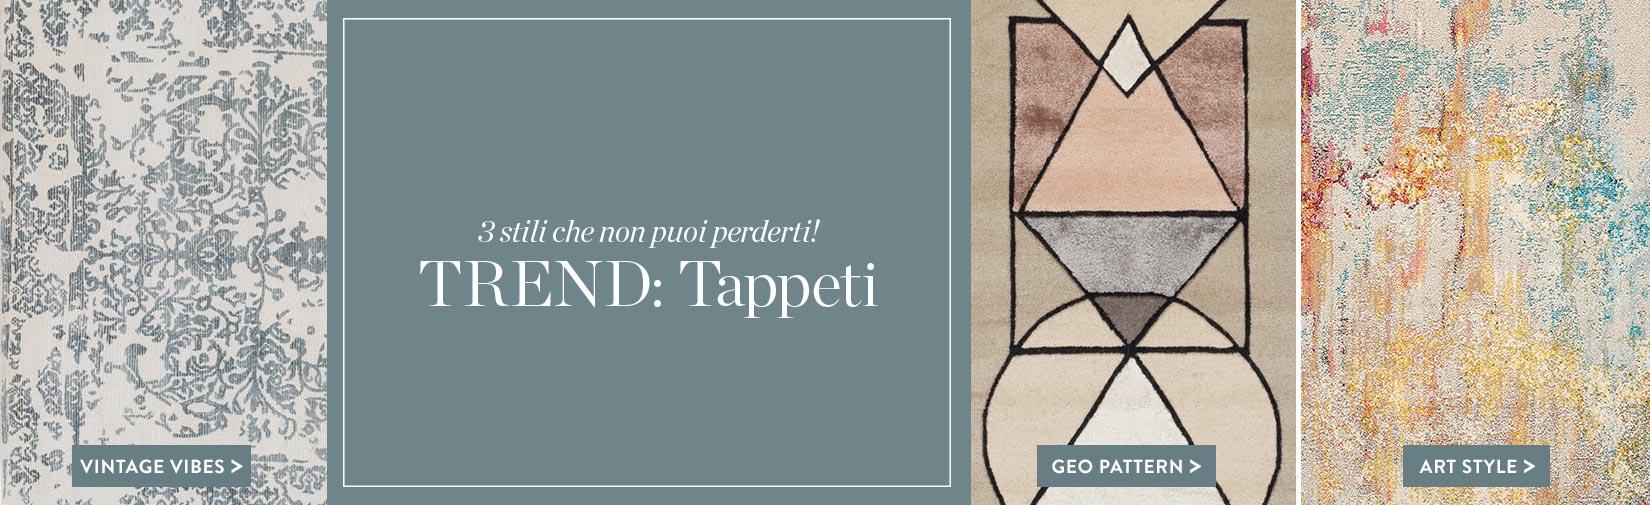 LP_Tappeti-trend_all_Desktop